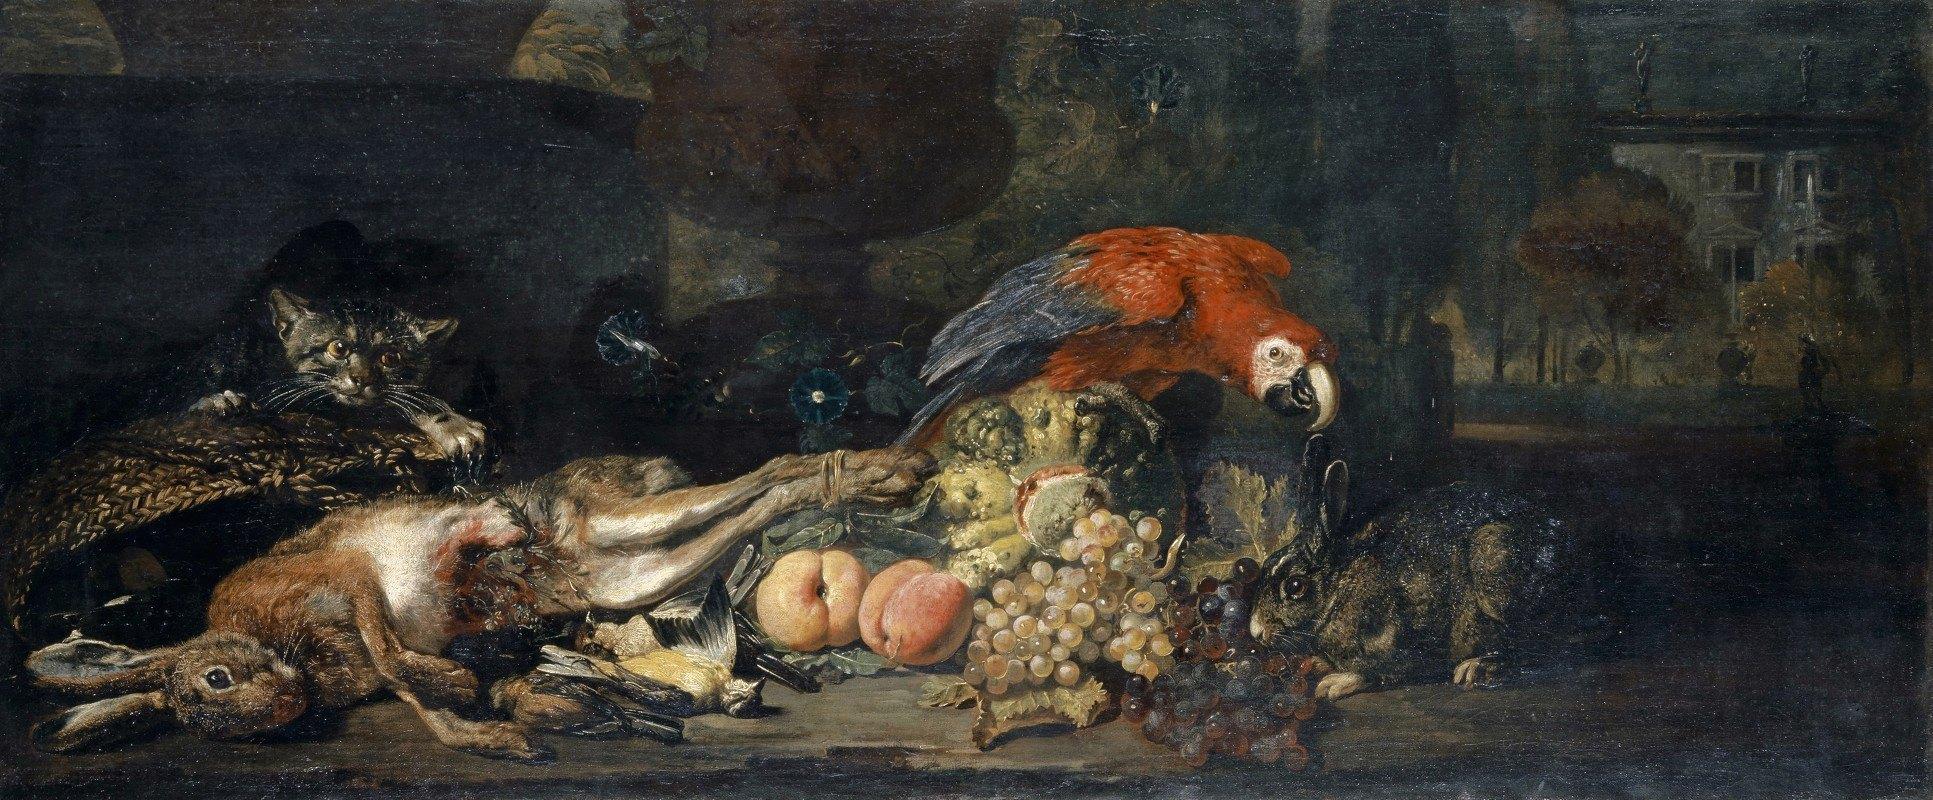 David de Coninck - Still Life With Game And Fruits, Parrot, Rabbit And Cat